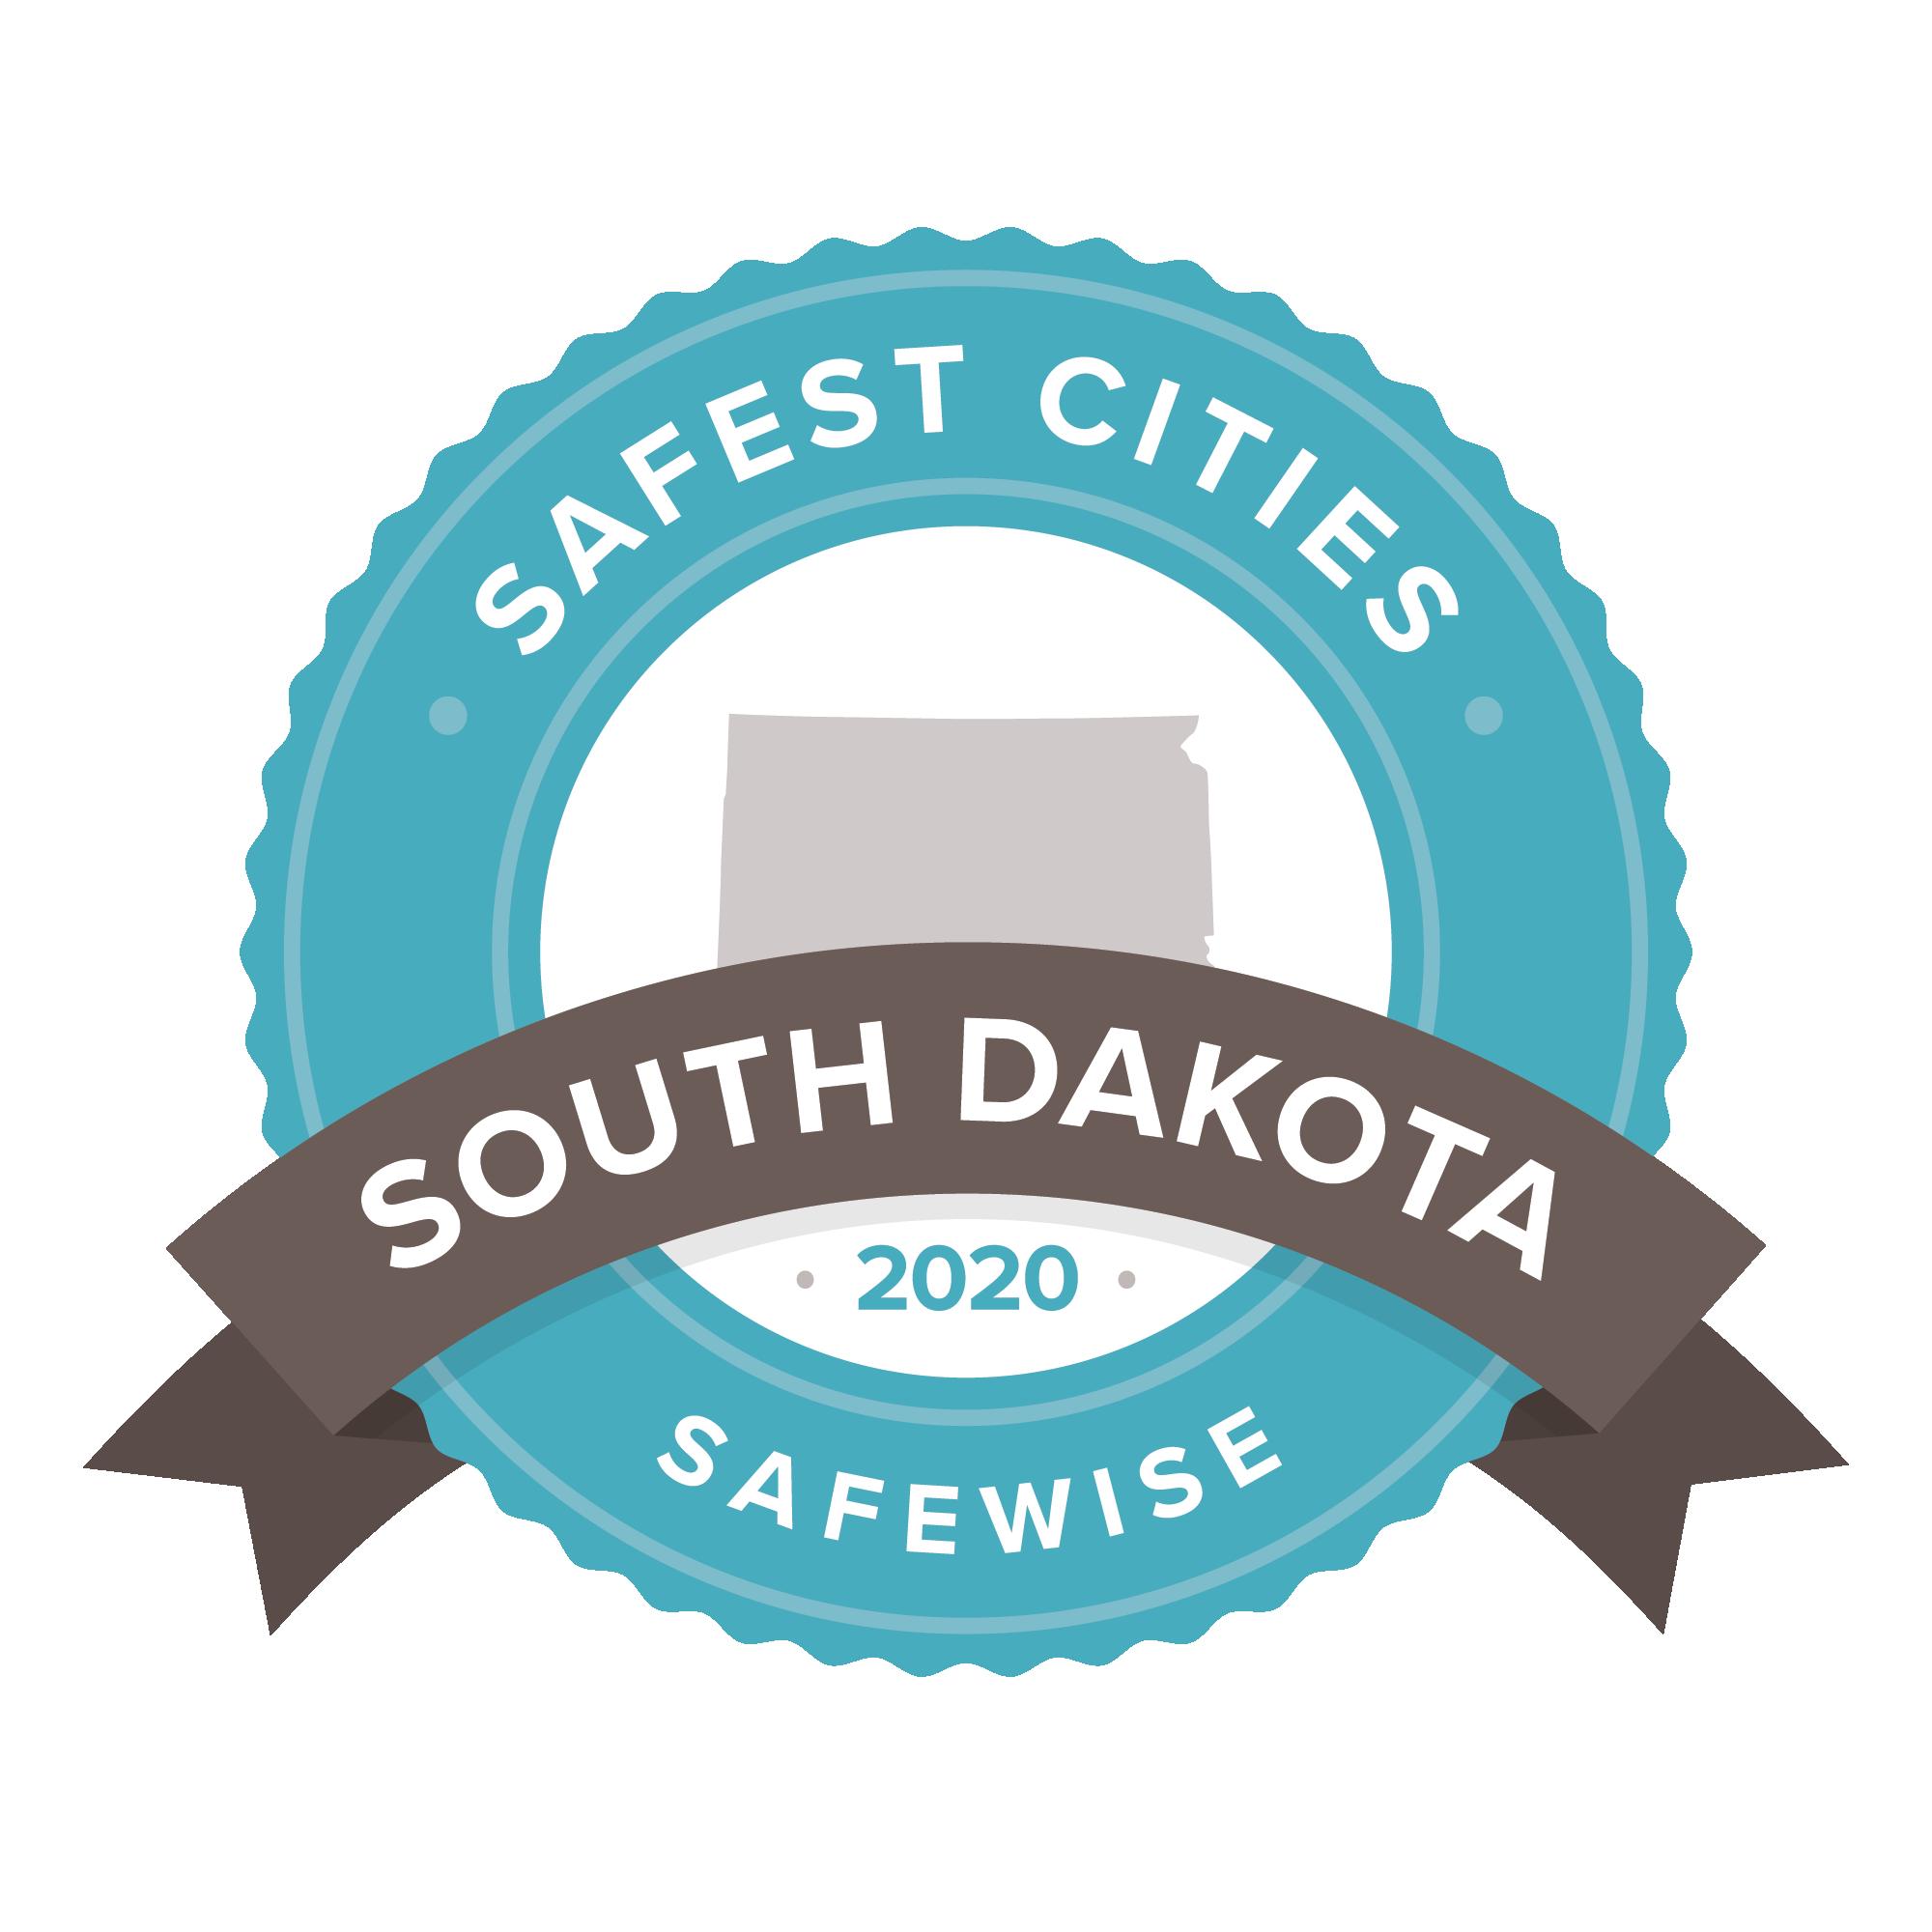 South Dakota Safest Cities badge